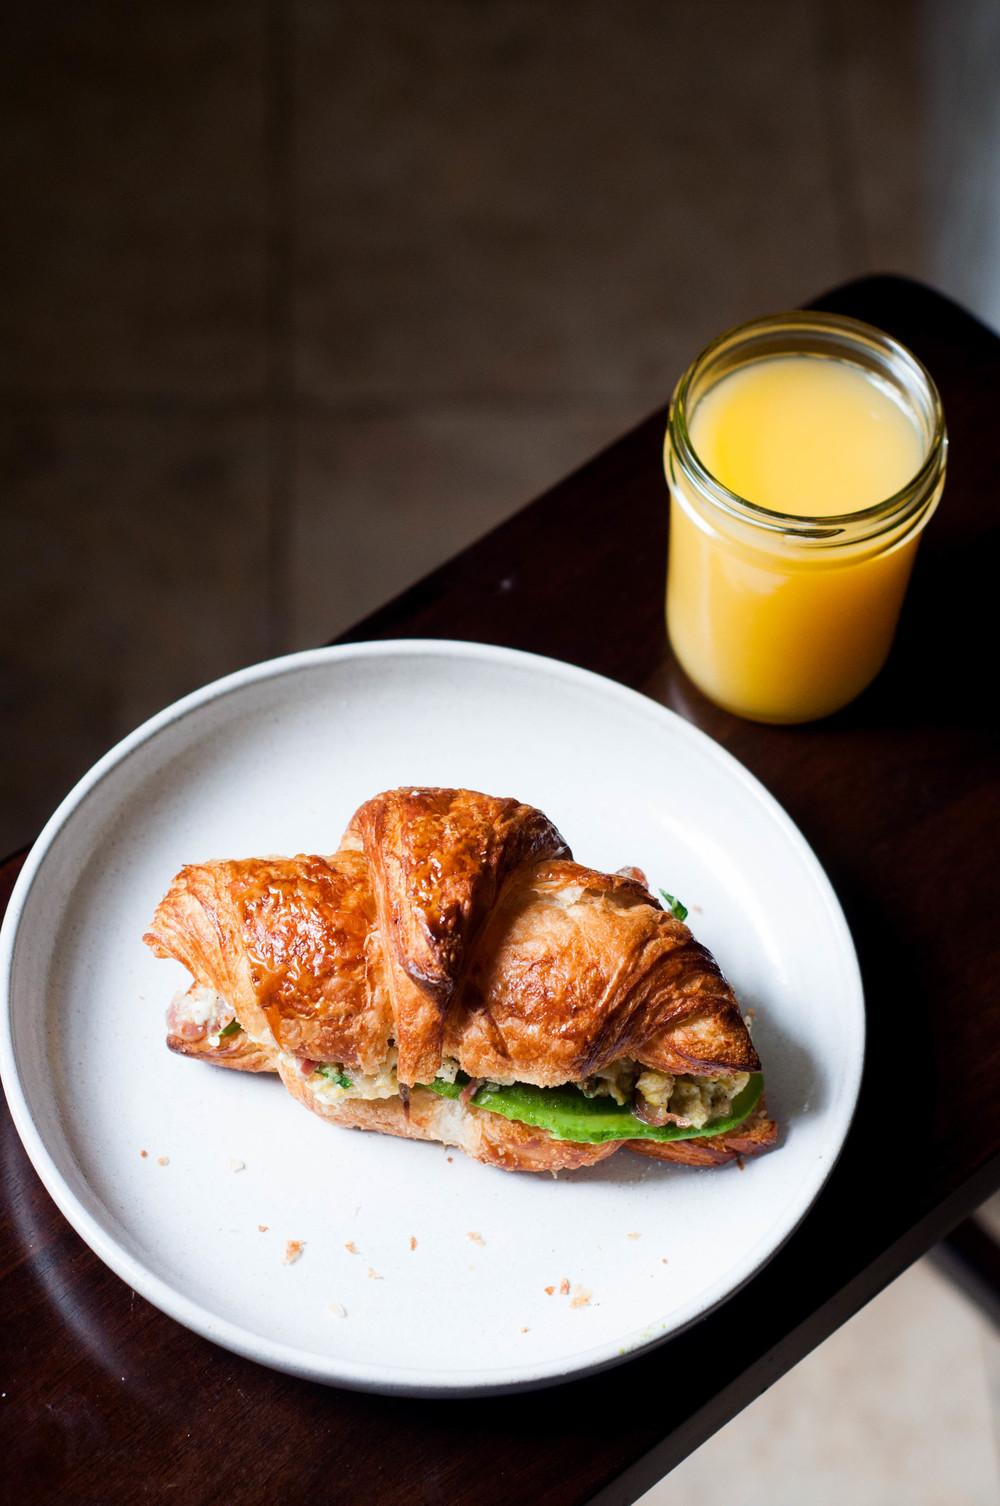 Lamb proscuitto scrambled egg croissant sandwich